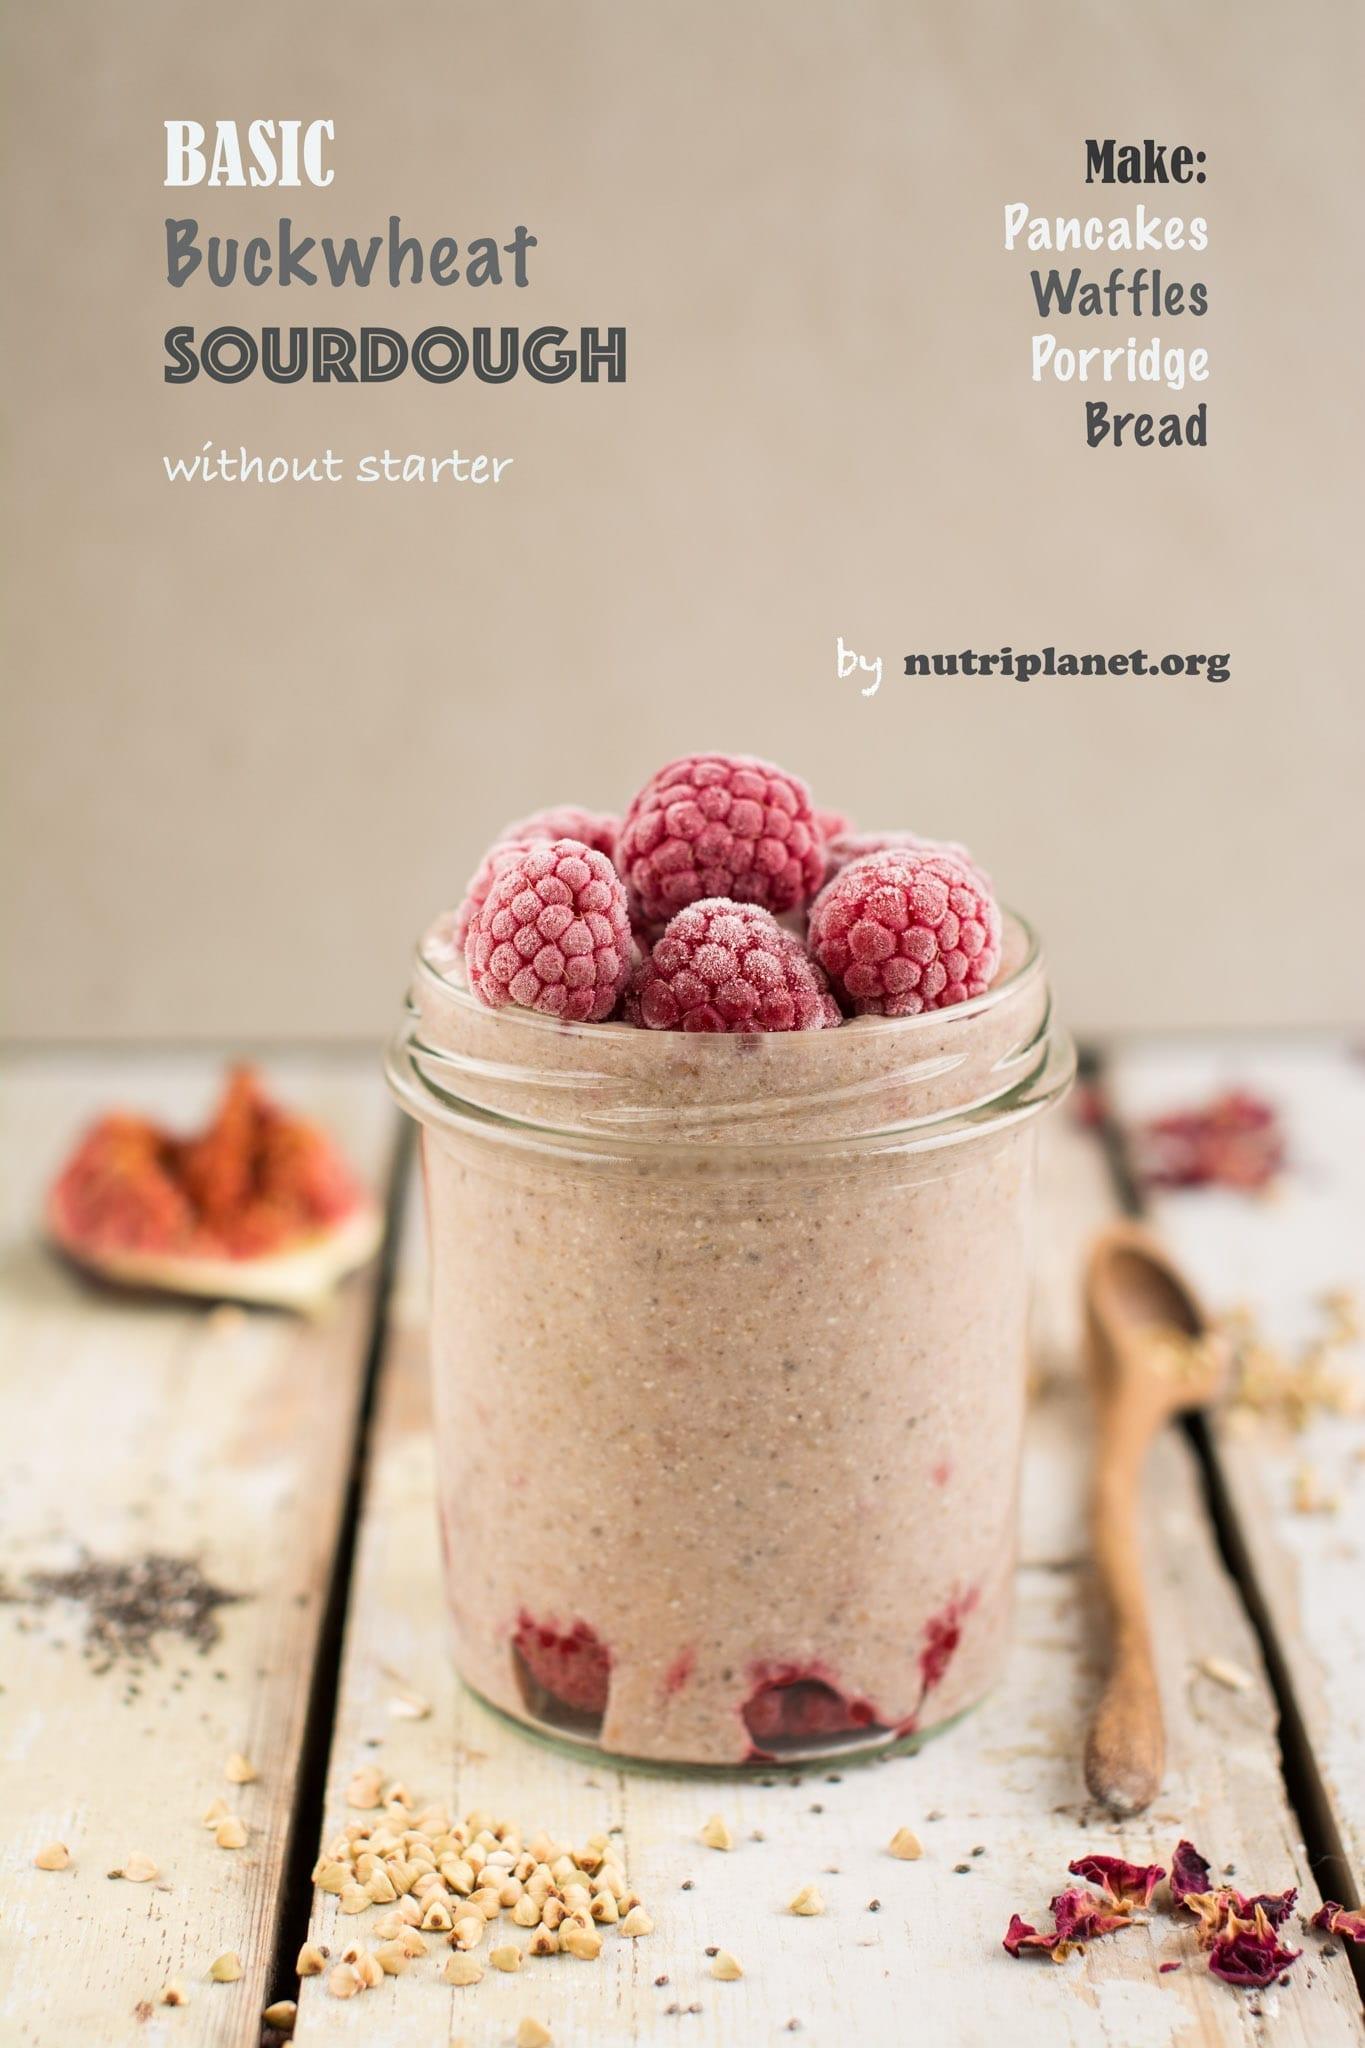 Basic Buckwheat Sourdough Recipe